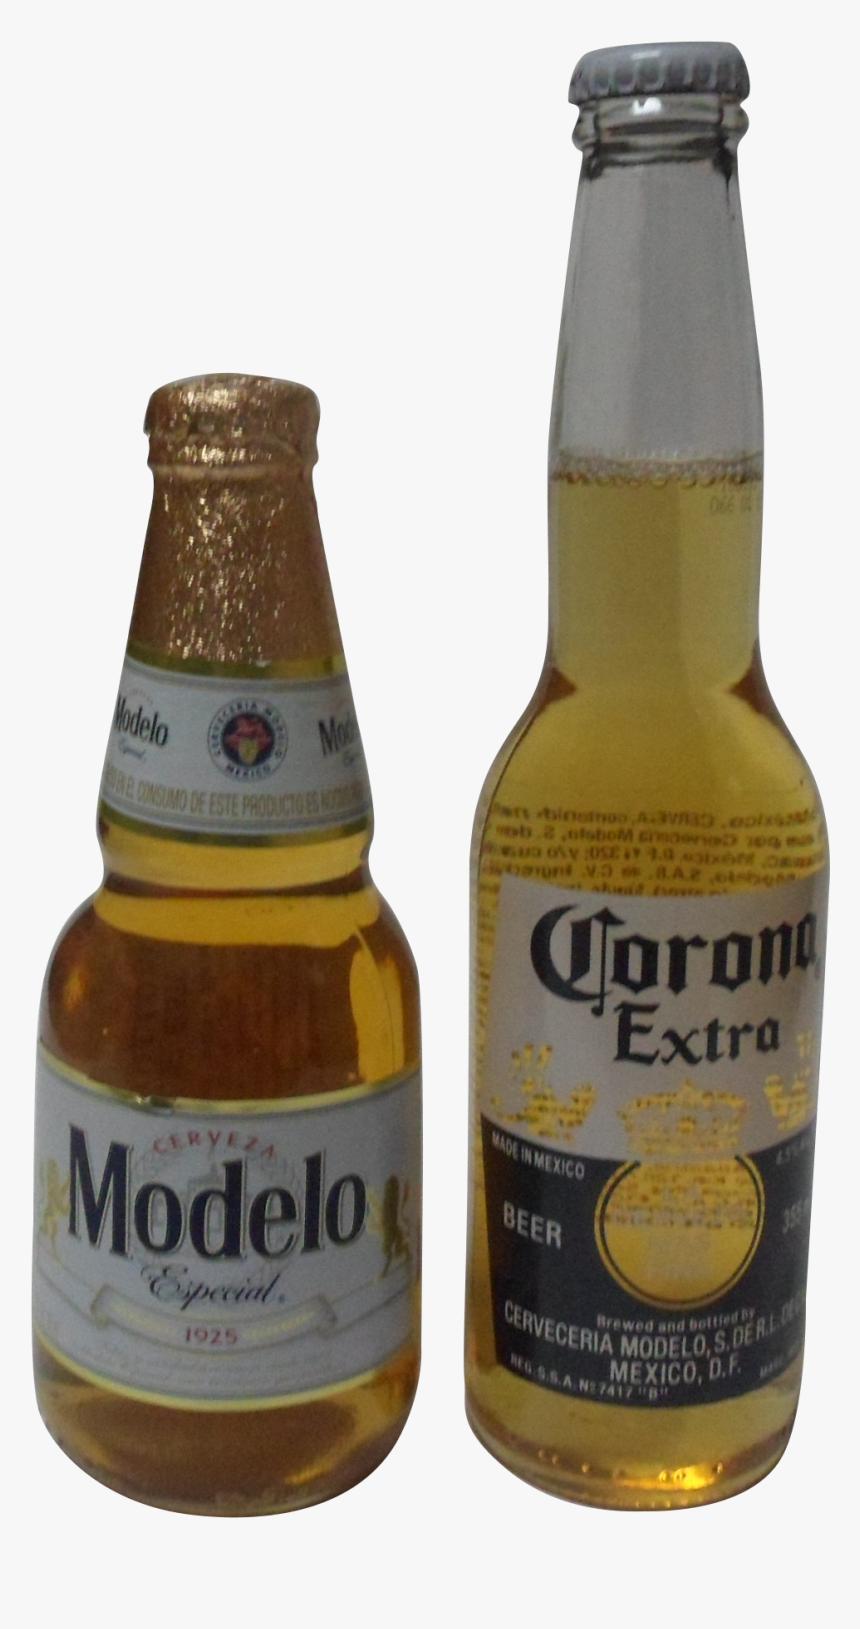 Cerveza Modelo Y Cerveza Corona Q 7 50 Normal Q, HD Png Download, Free Download